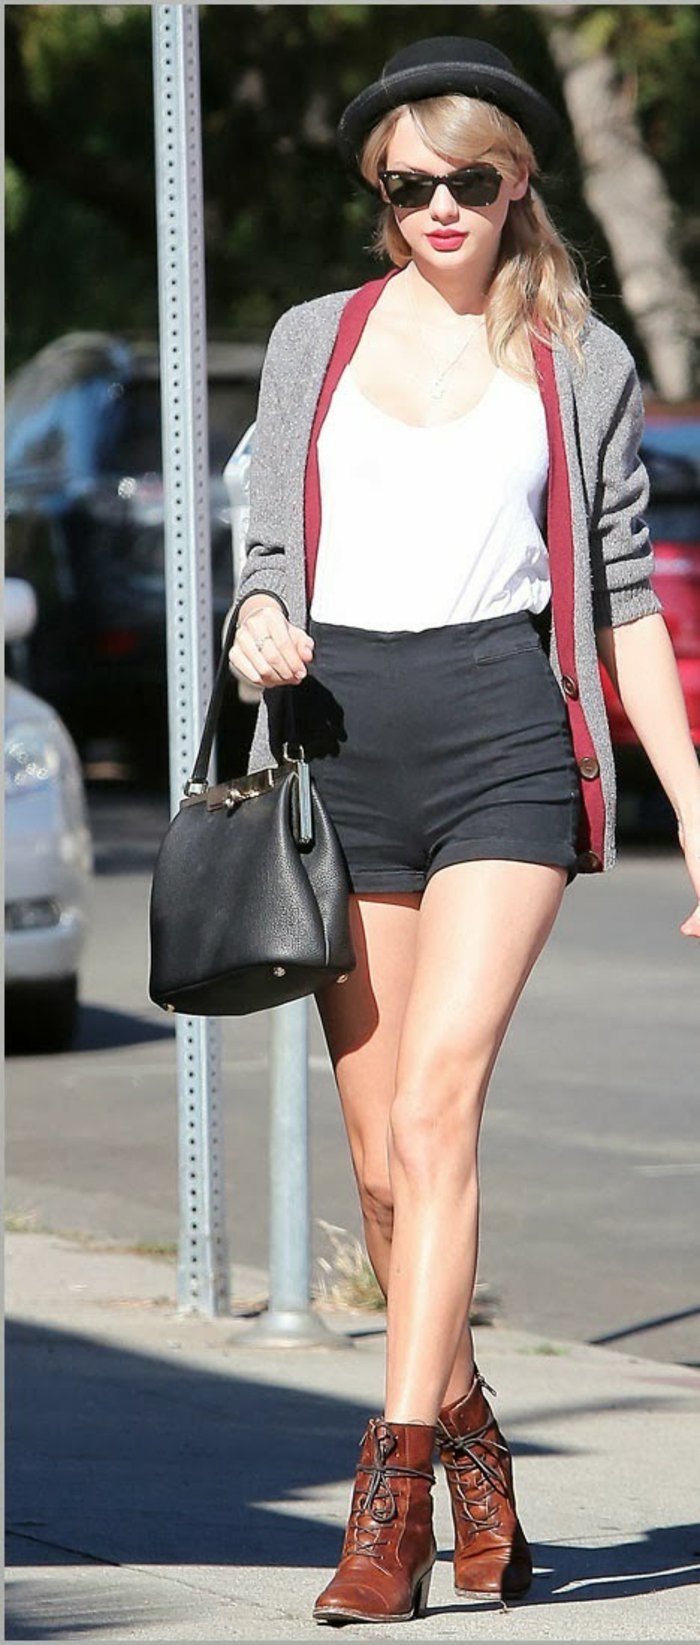 Taylor-Swift-strickjacke-grau-Hut-kreative-Styling-Idee